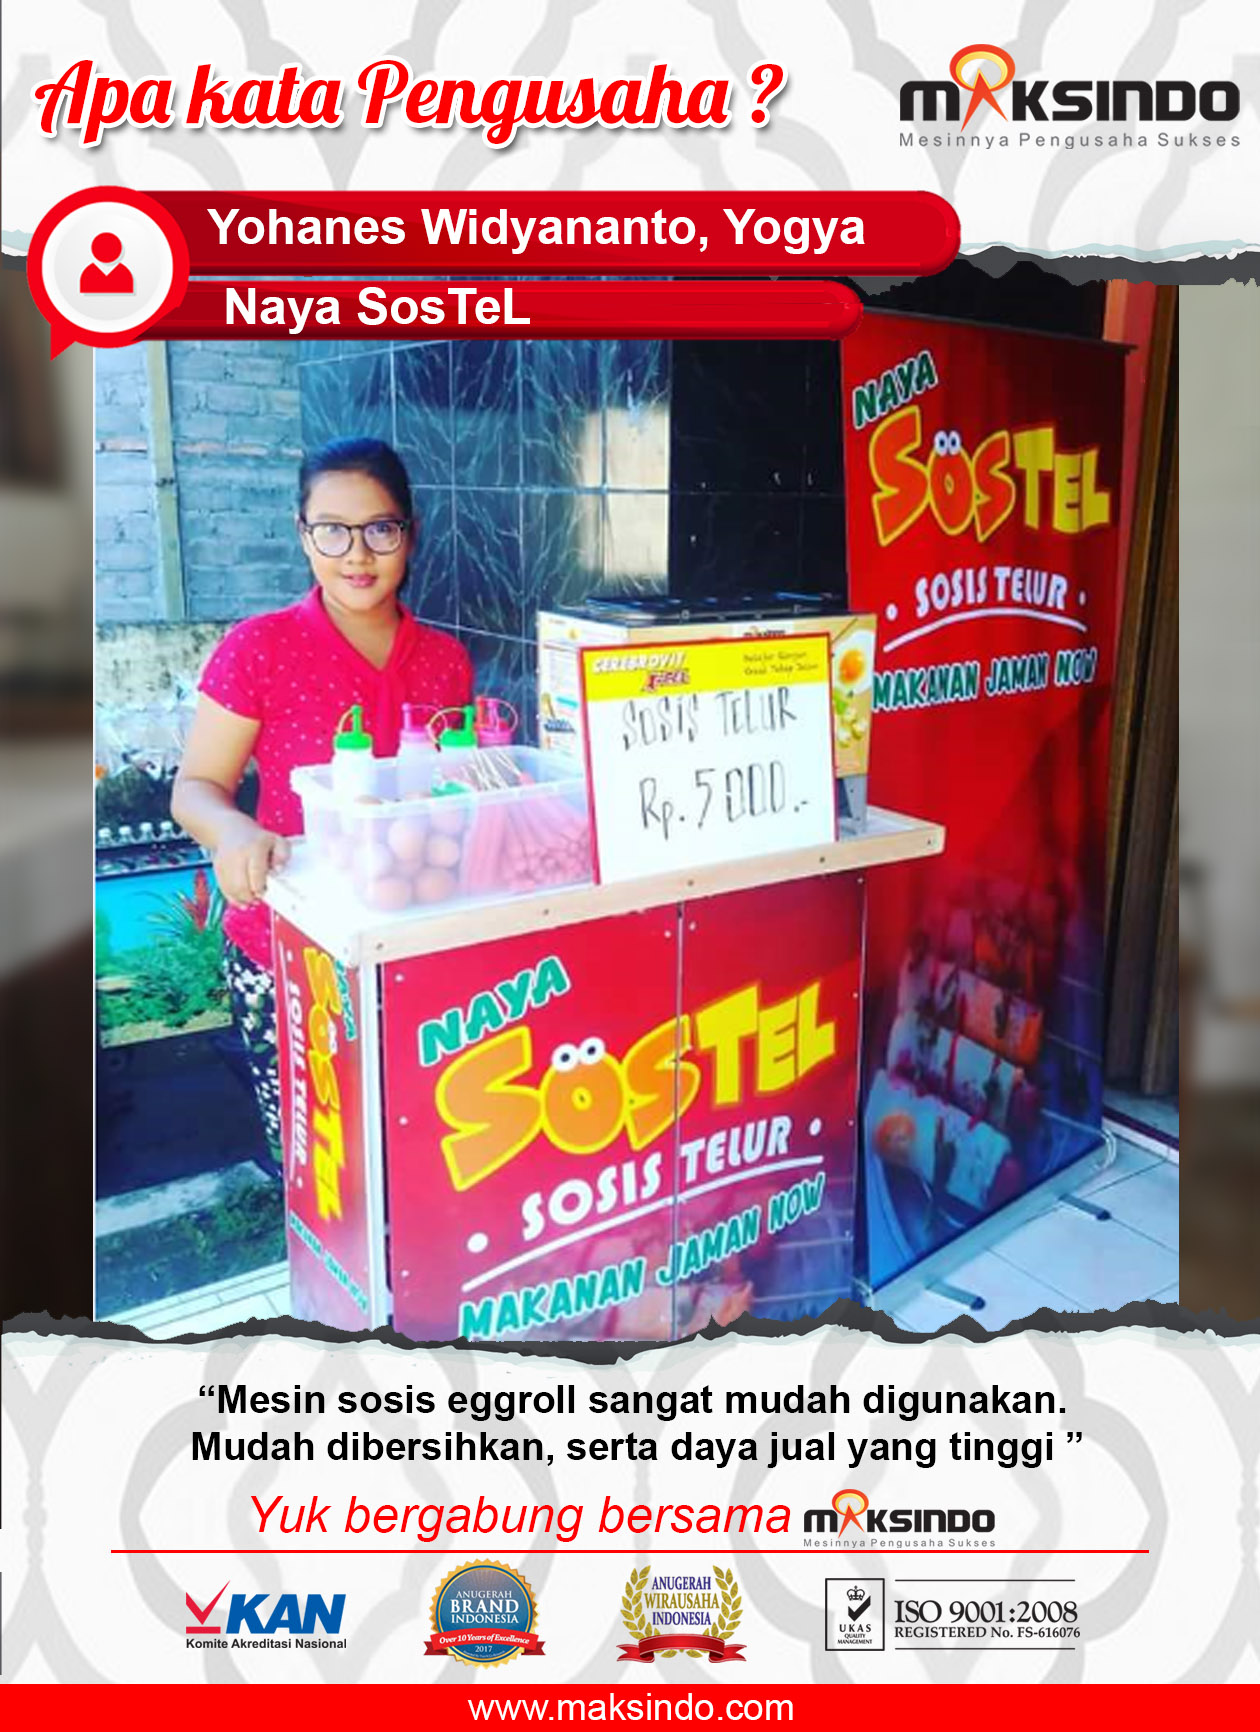 Naya SosTel : Pengusaha Sostel Yang Puas Dengan Mesin Egg Roll Dari Maksindo